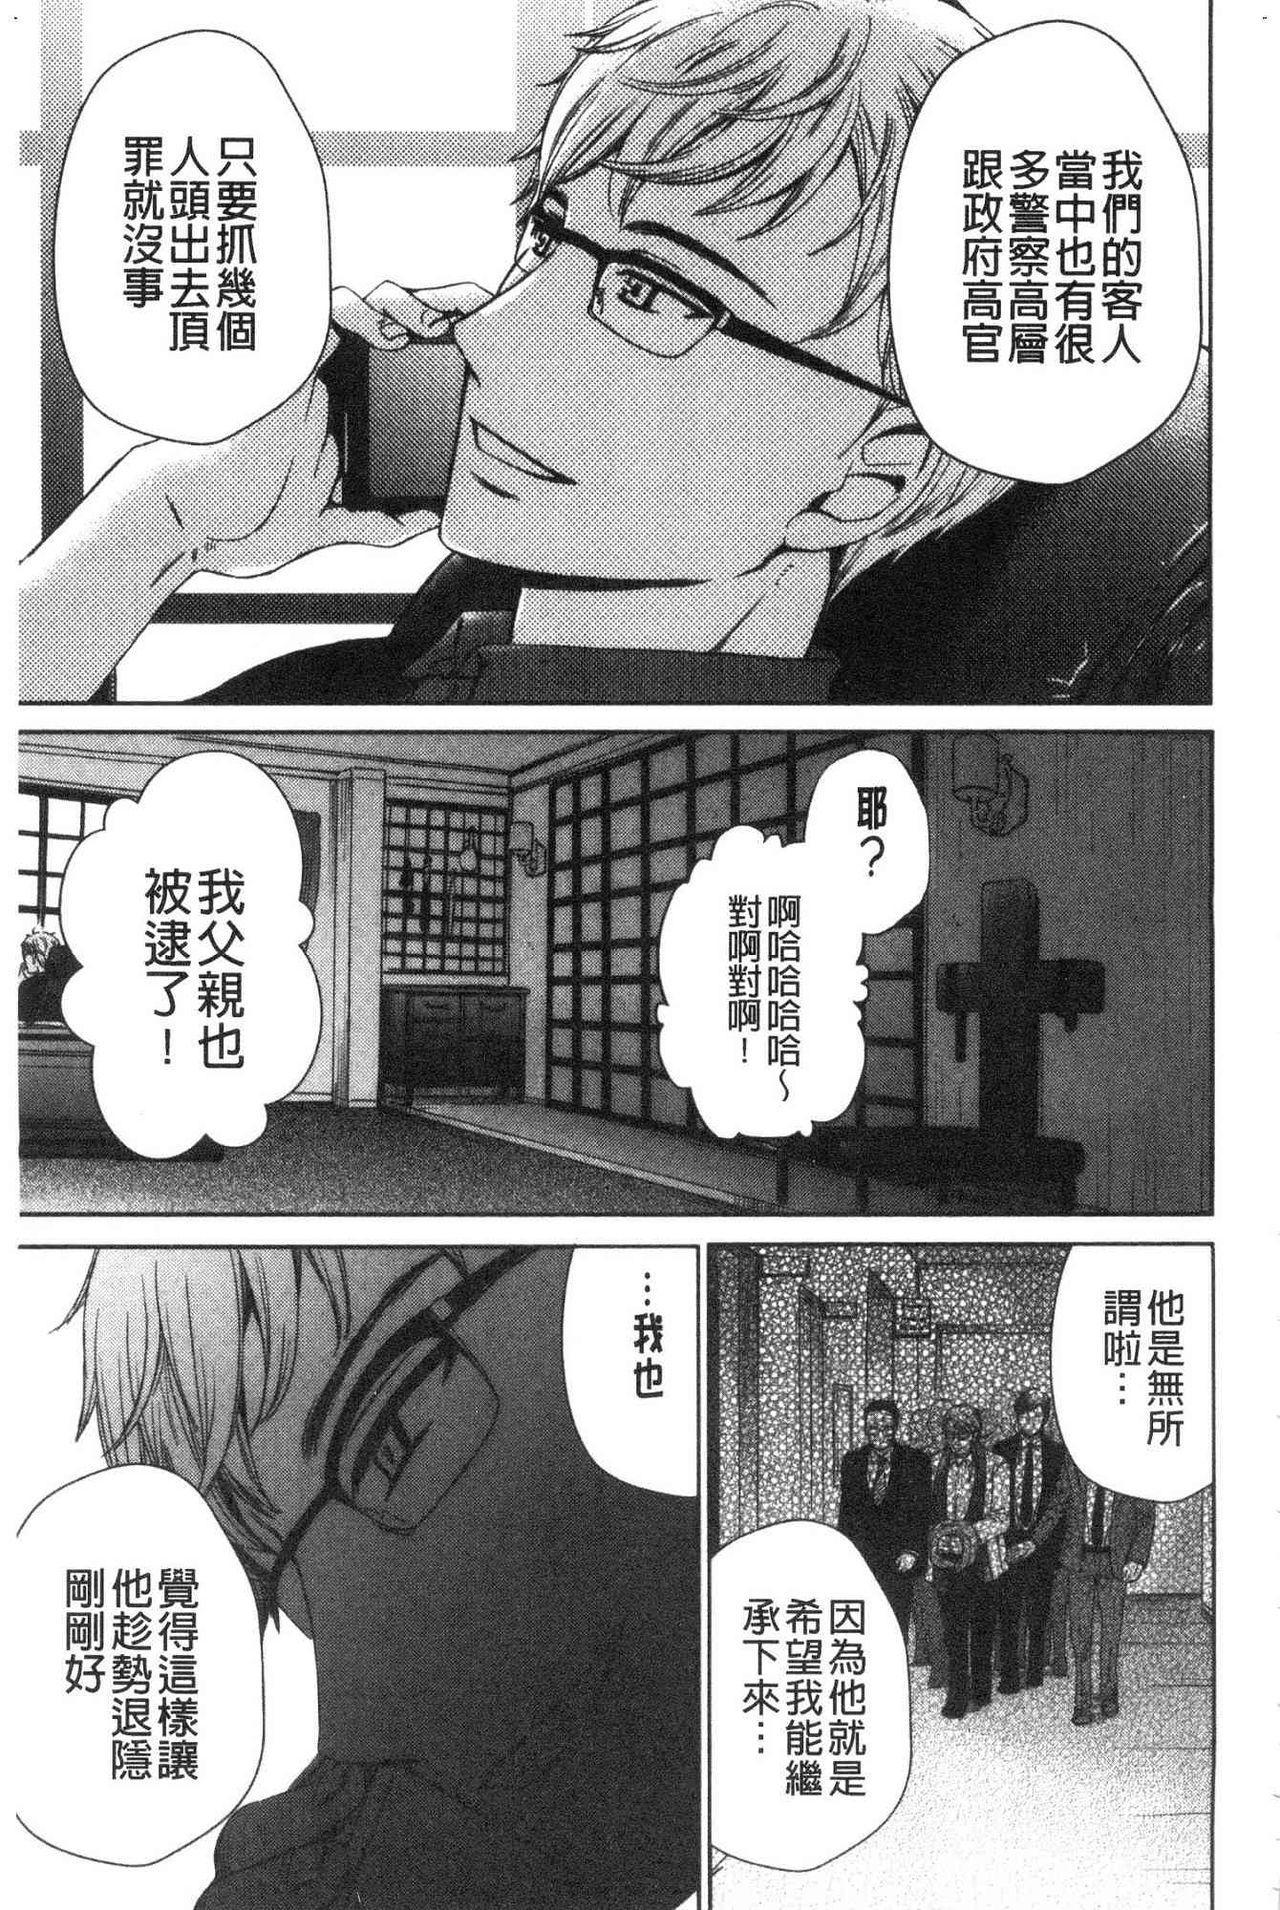 [Gotoh Akira]  21-ji no Onna ~Camera no Mae no Mesuinu~ 2 | 21時之女 ~鏡頭前的牝犬~ 2 [Chinese] 202